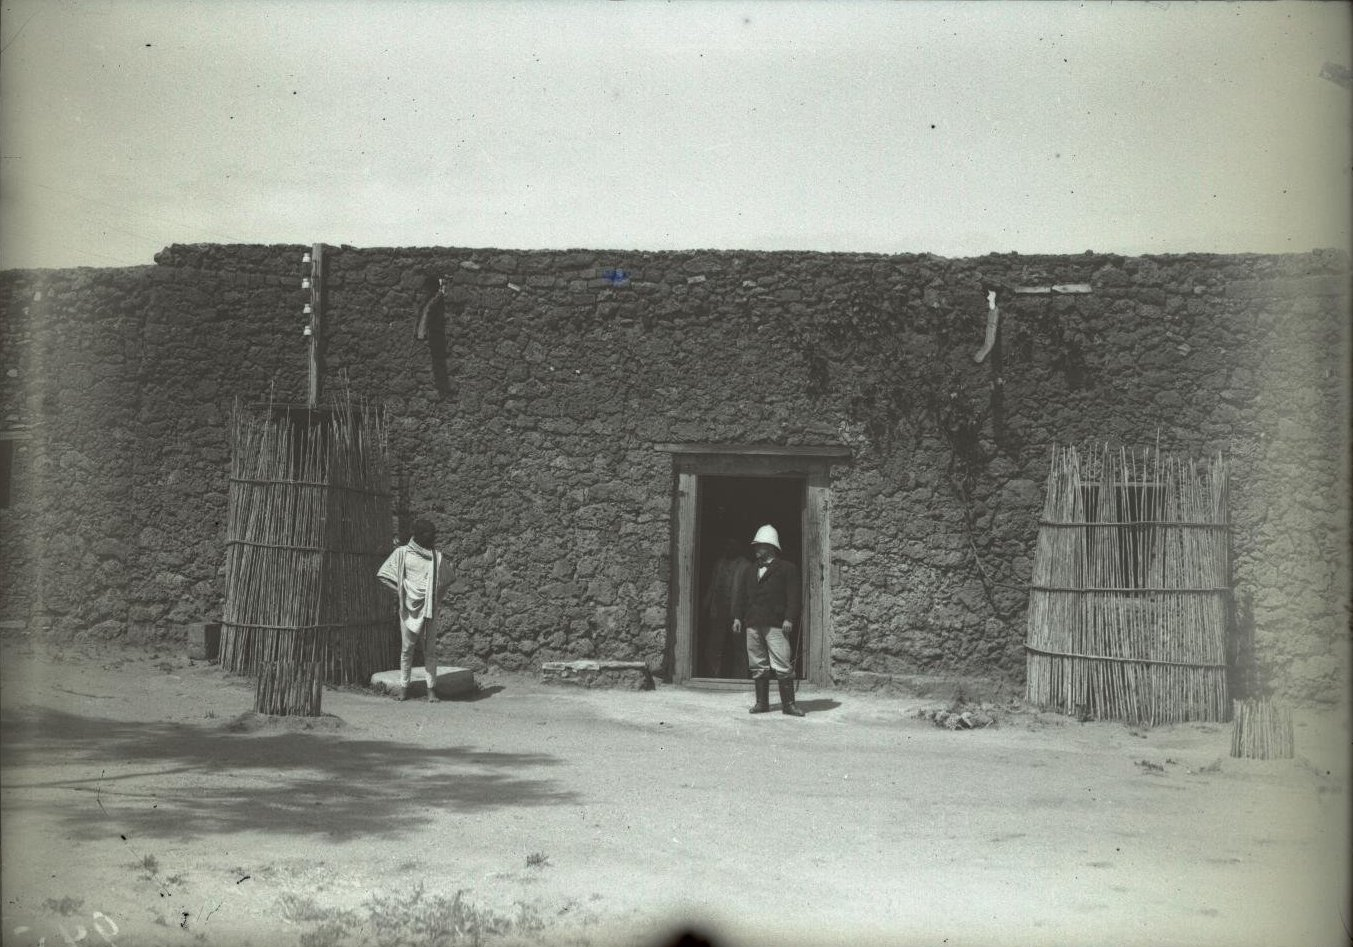 245. Абиссиния, провинция Харар, г. Харар. Телеграфная и телефонная станция